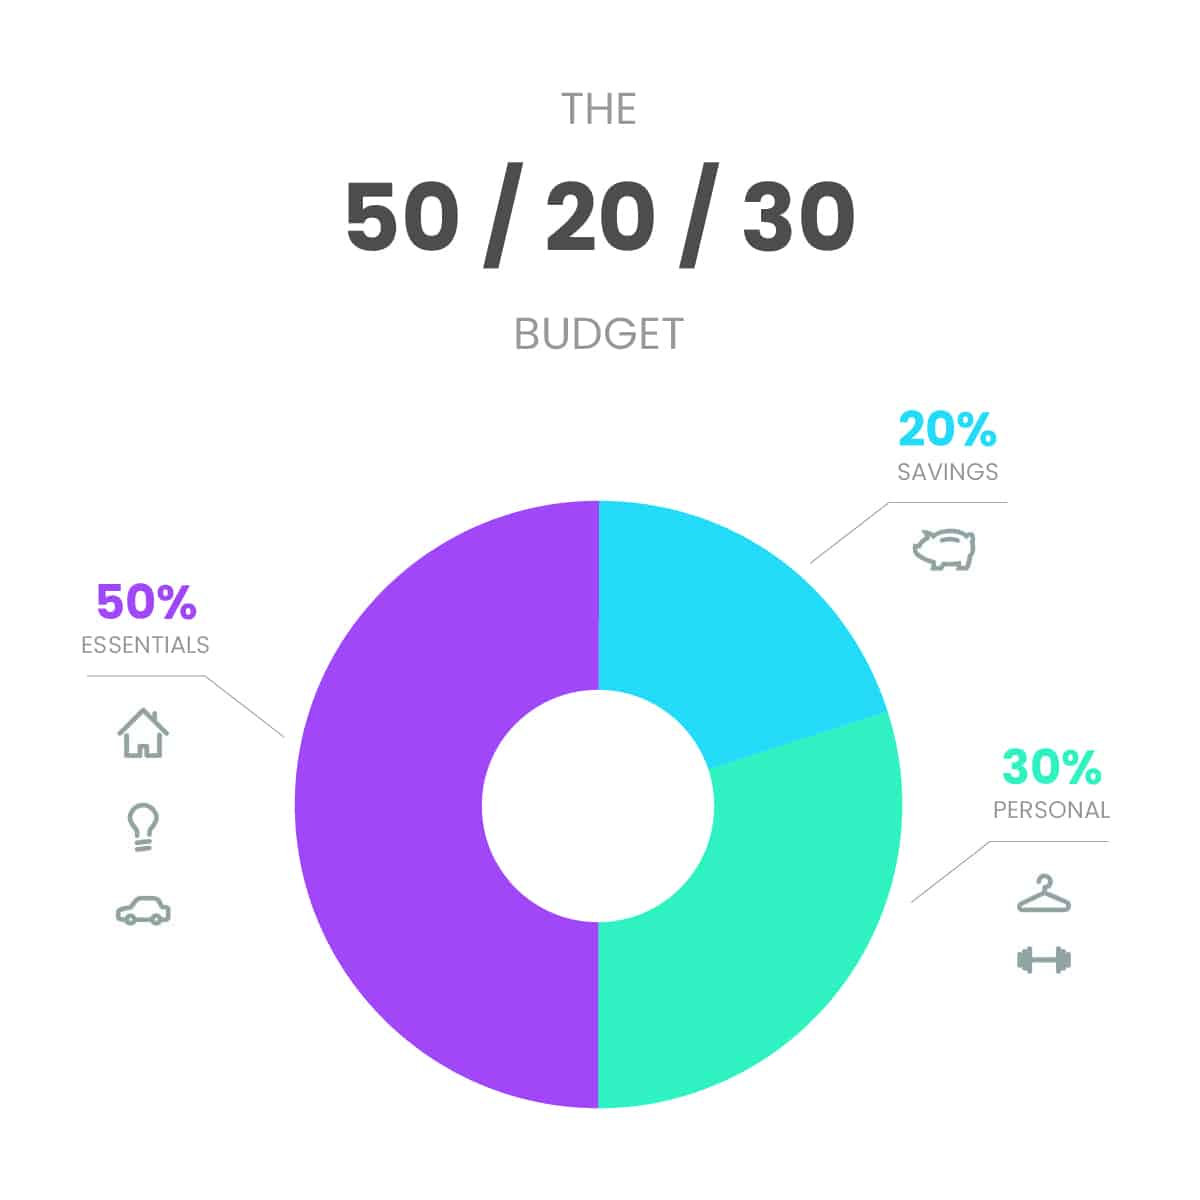 the 50/20/30 budget breakdown